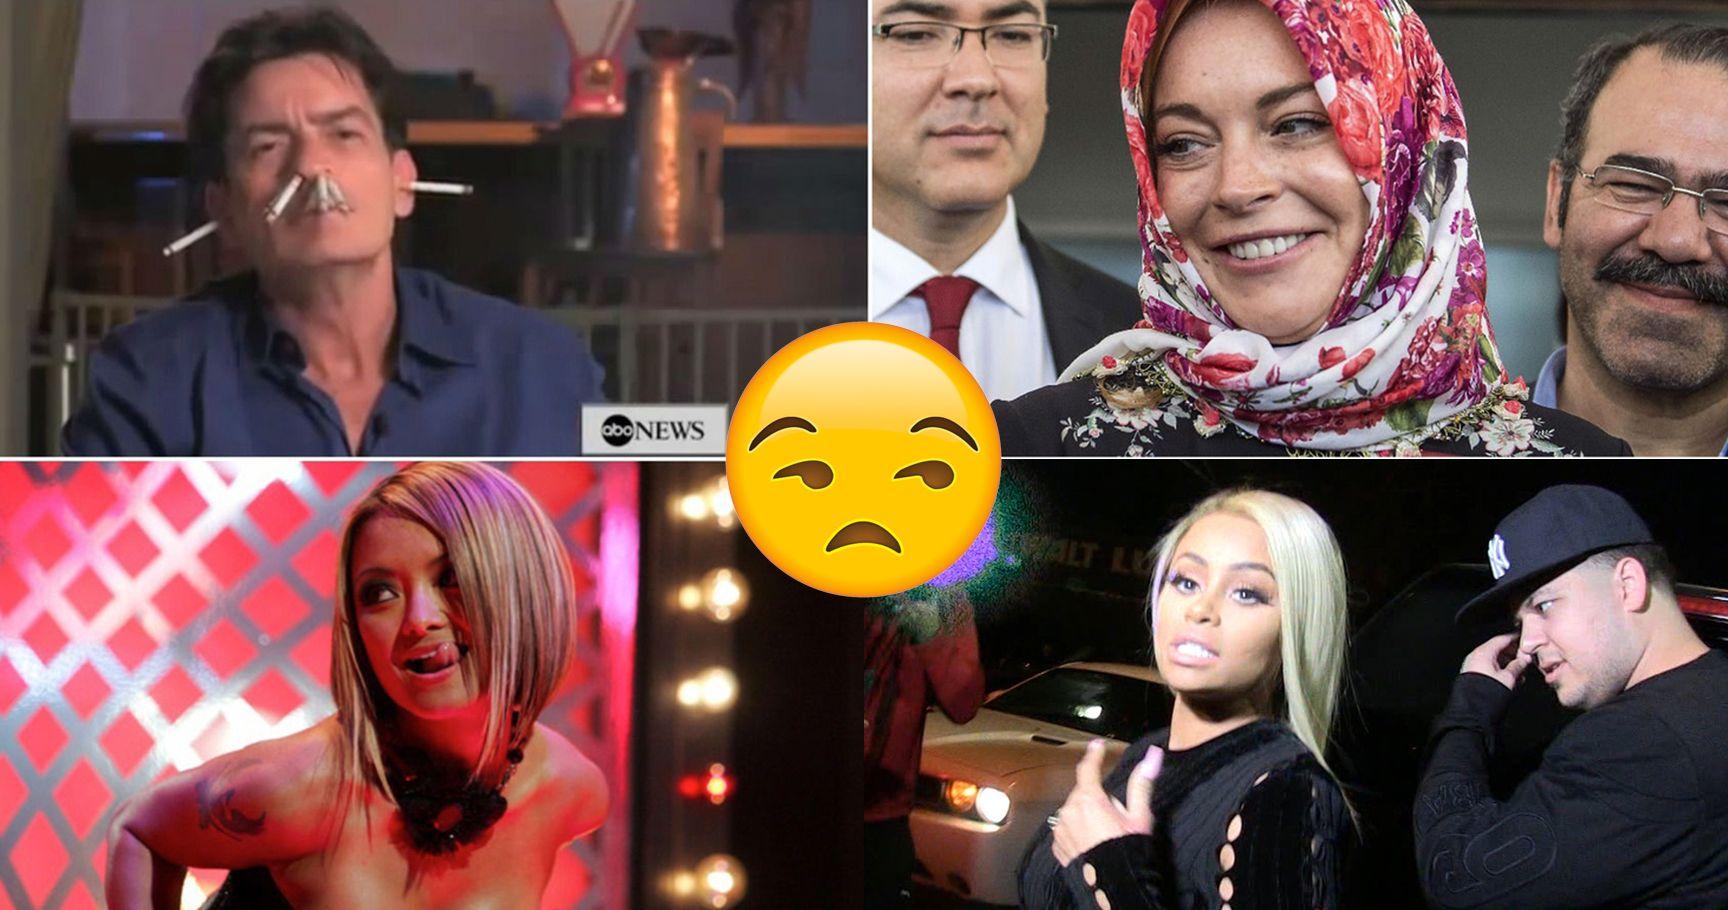 15 Scandalous Celebs Who Totally Deserve Their D-List Status